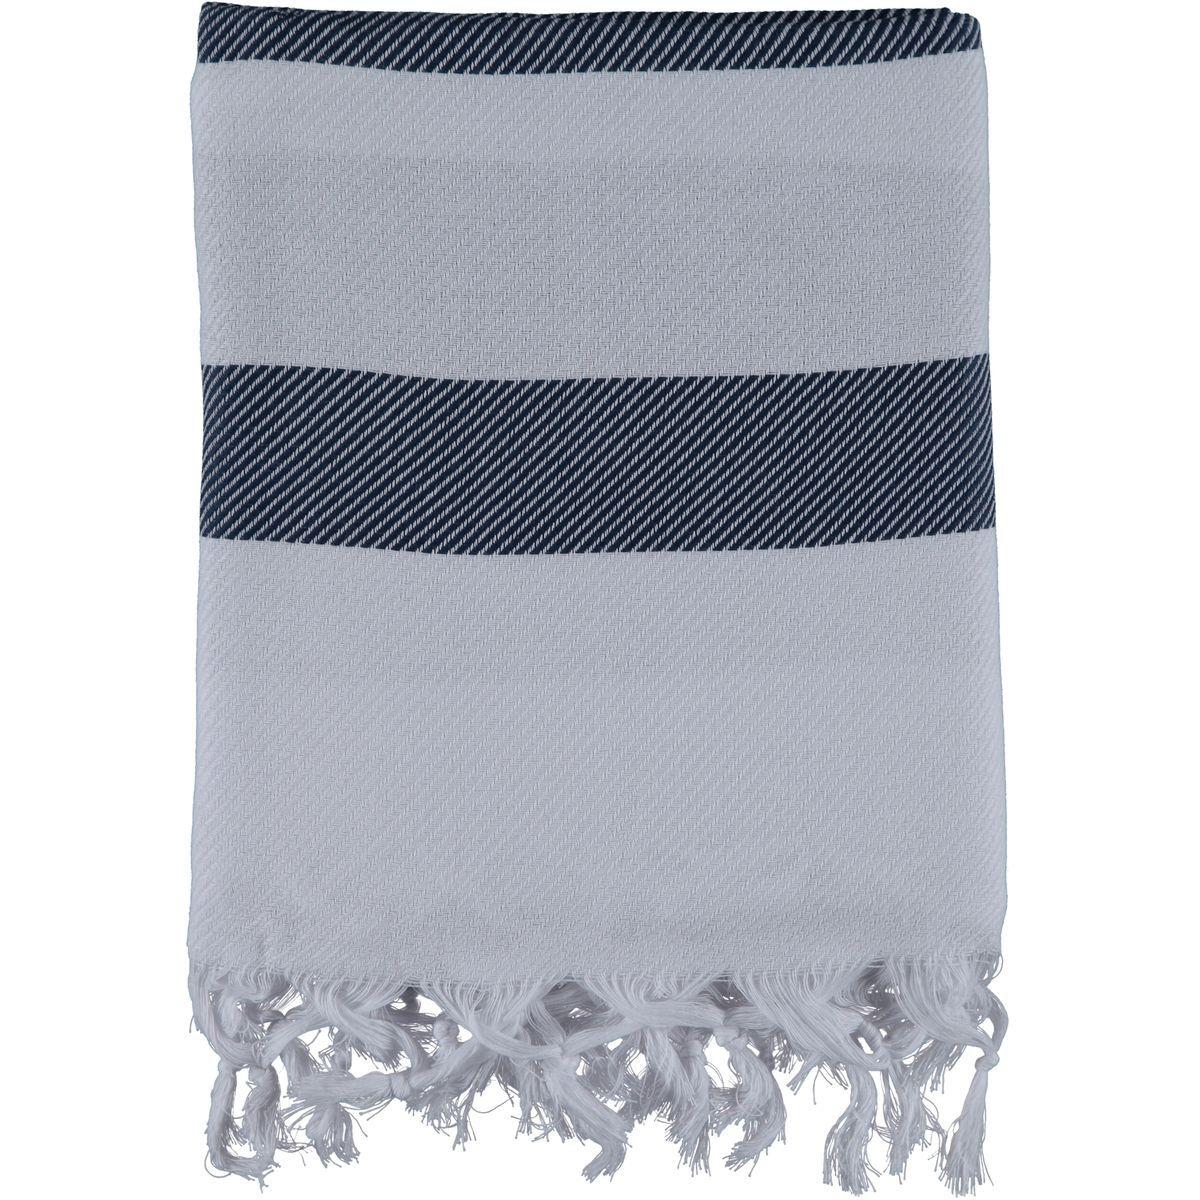 Peshtemal / Towel Soho - White / Navy